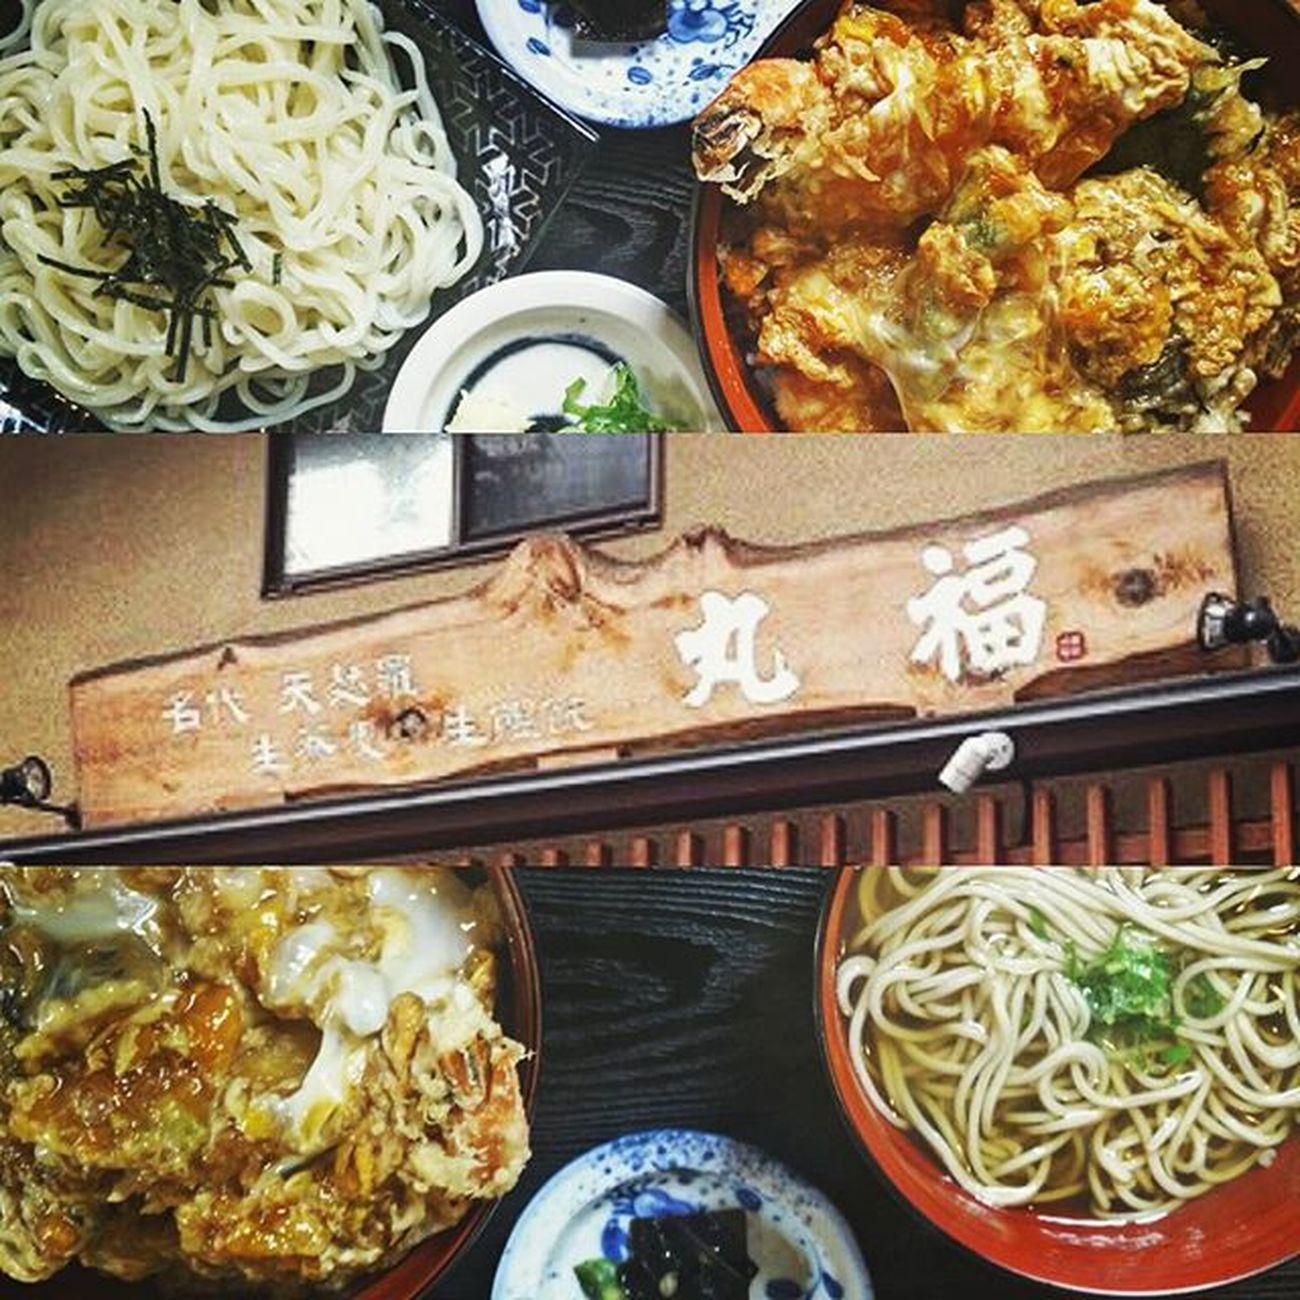 Marufuku cold udon, hot soba, & tempura donburi. 9 out of 10 Kyotostation Japan Foodgasm Udon Soba Donburi